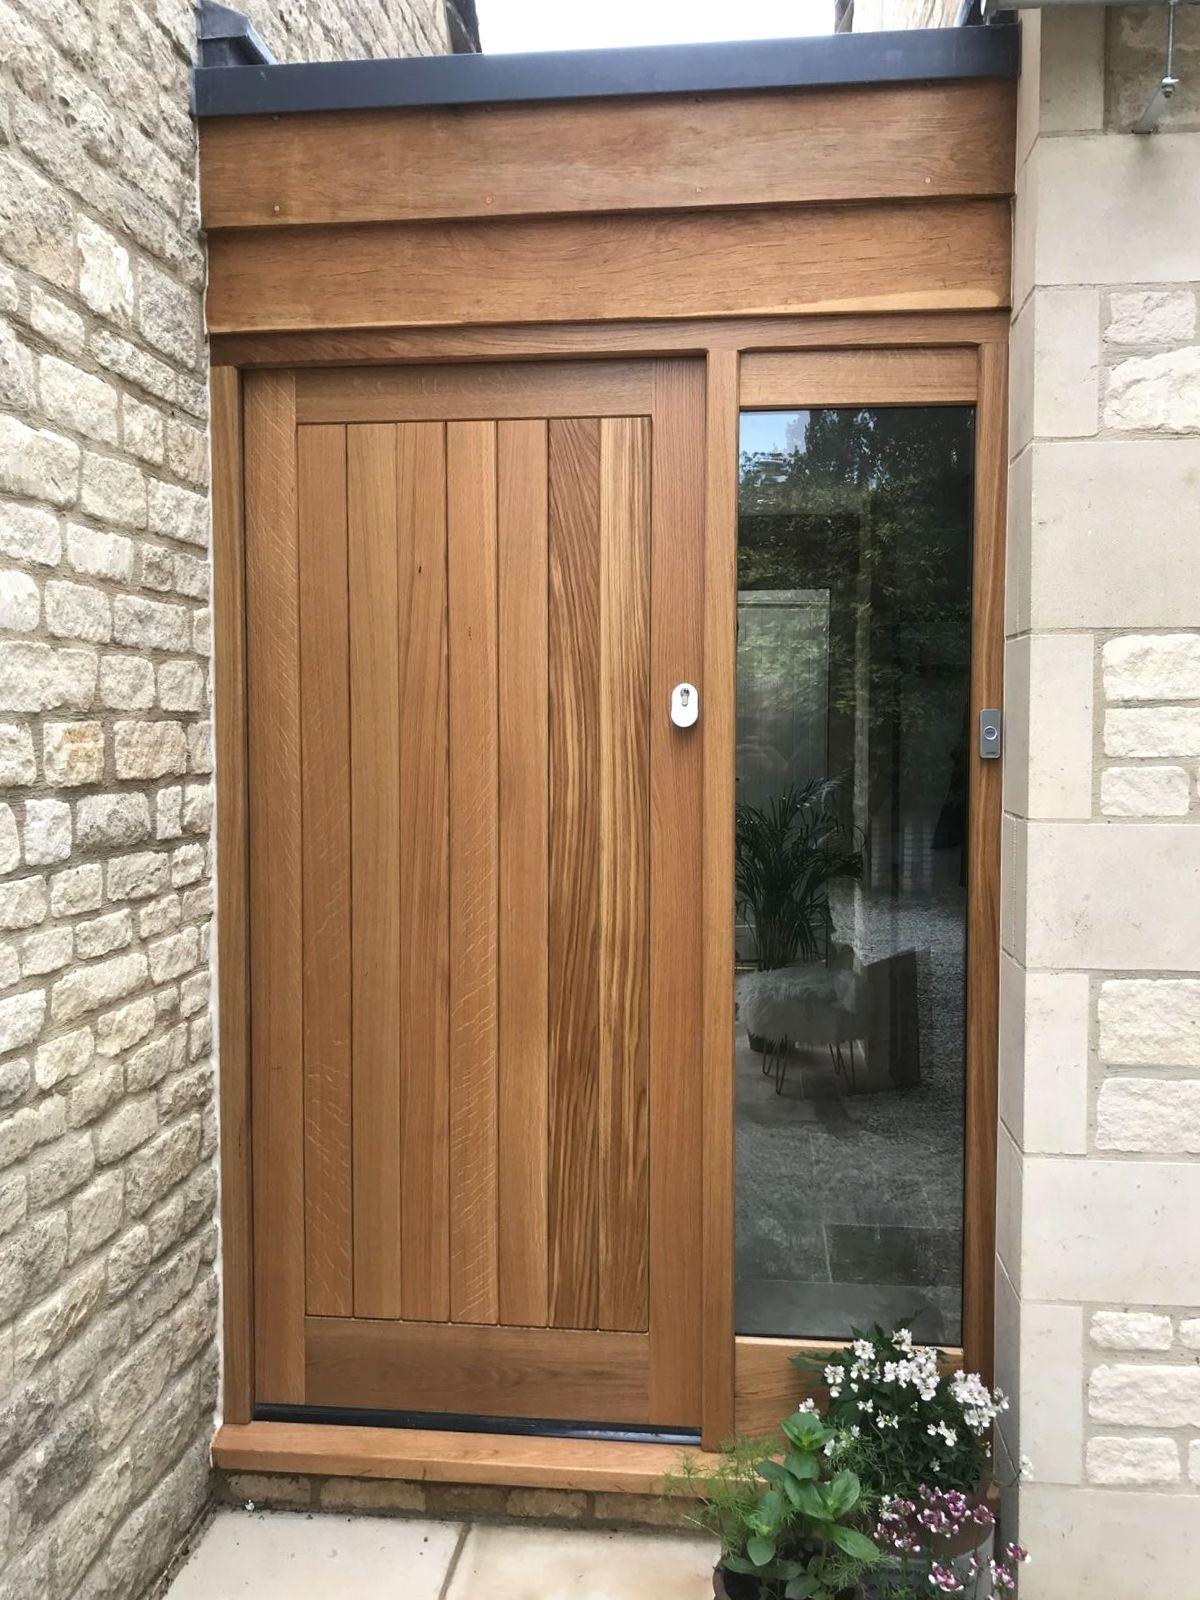 Stupendous Timber Doors In Oxfordshire Berks Bucks Kirkman Joinery Download Free Architecture Designs Scobabritishbridgeorg